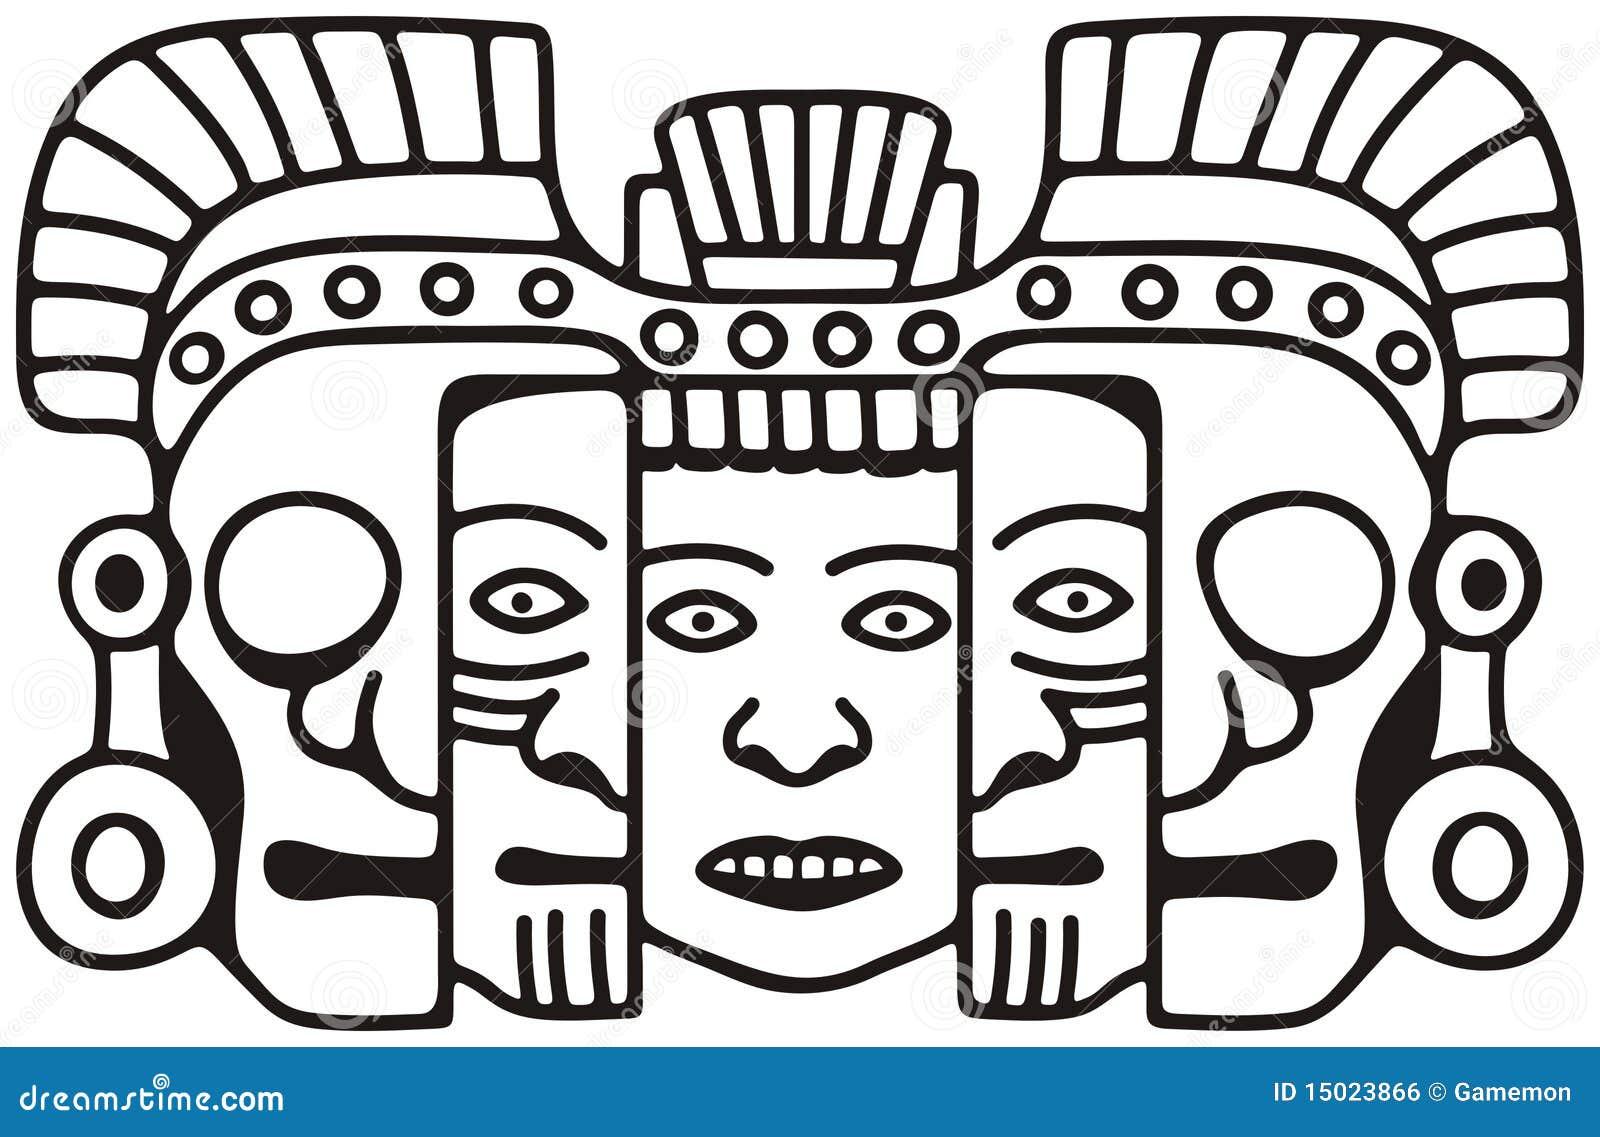 Mayan Mask Royalty Free Stock Image - Image: 15023866